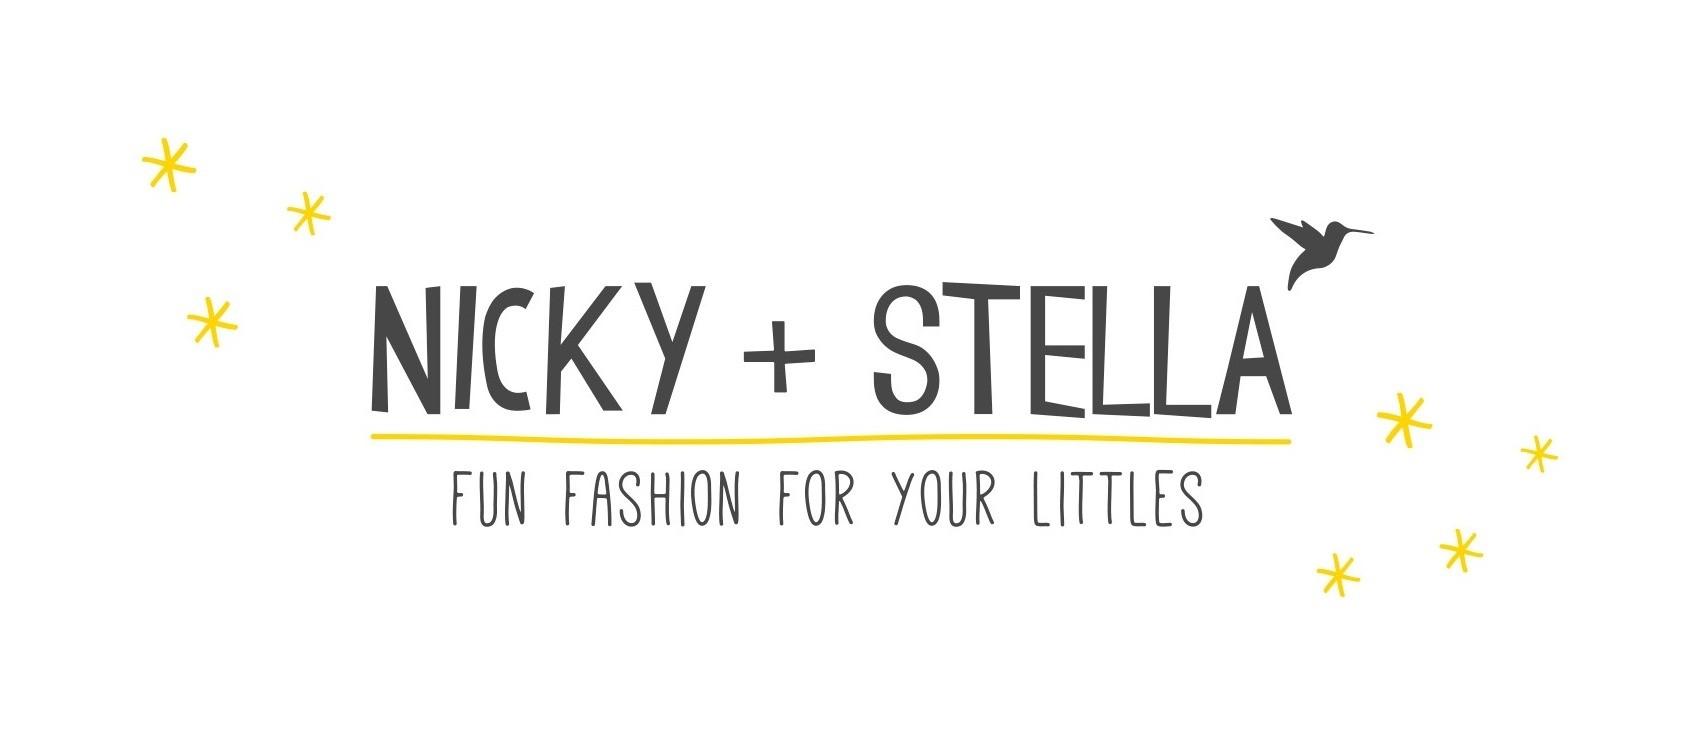 Nicky + Stella